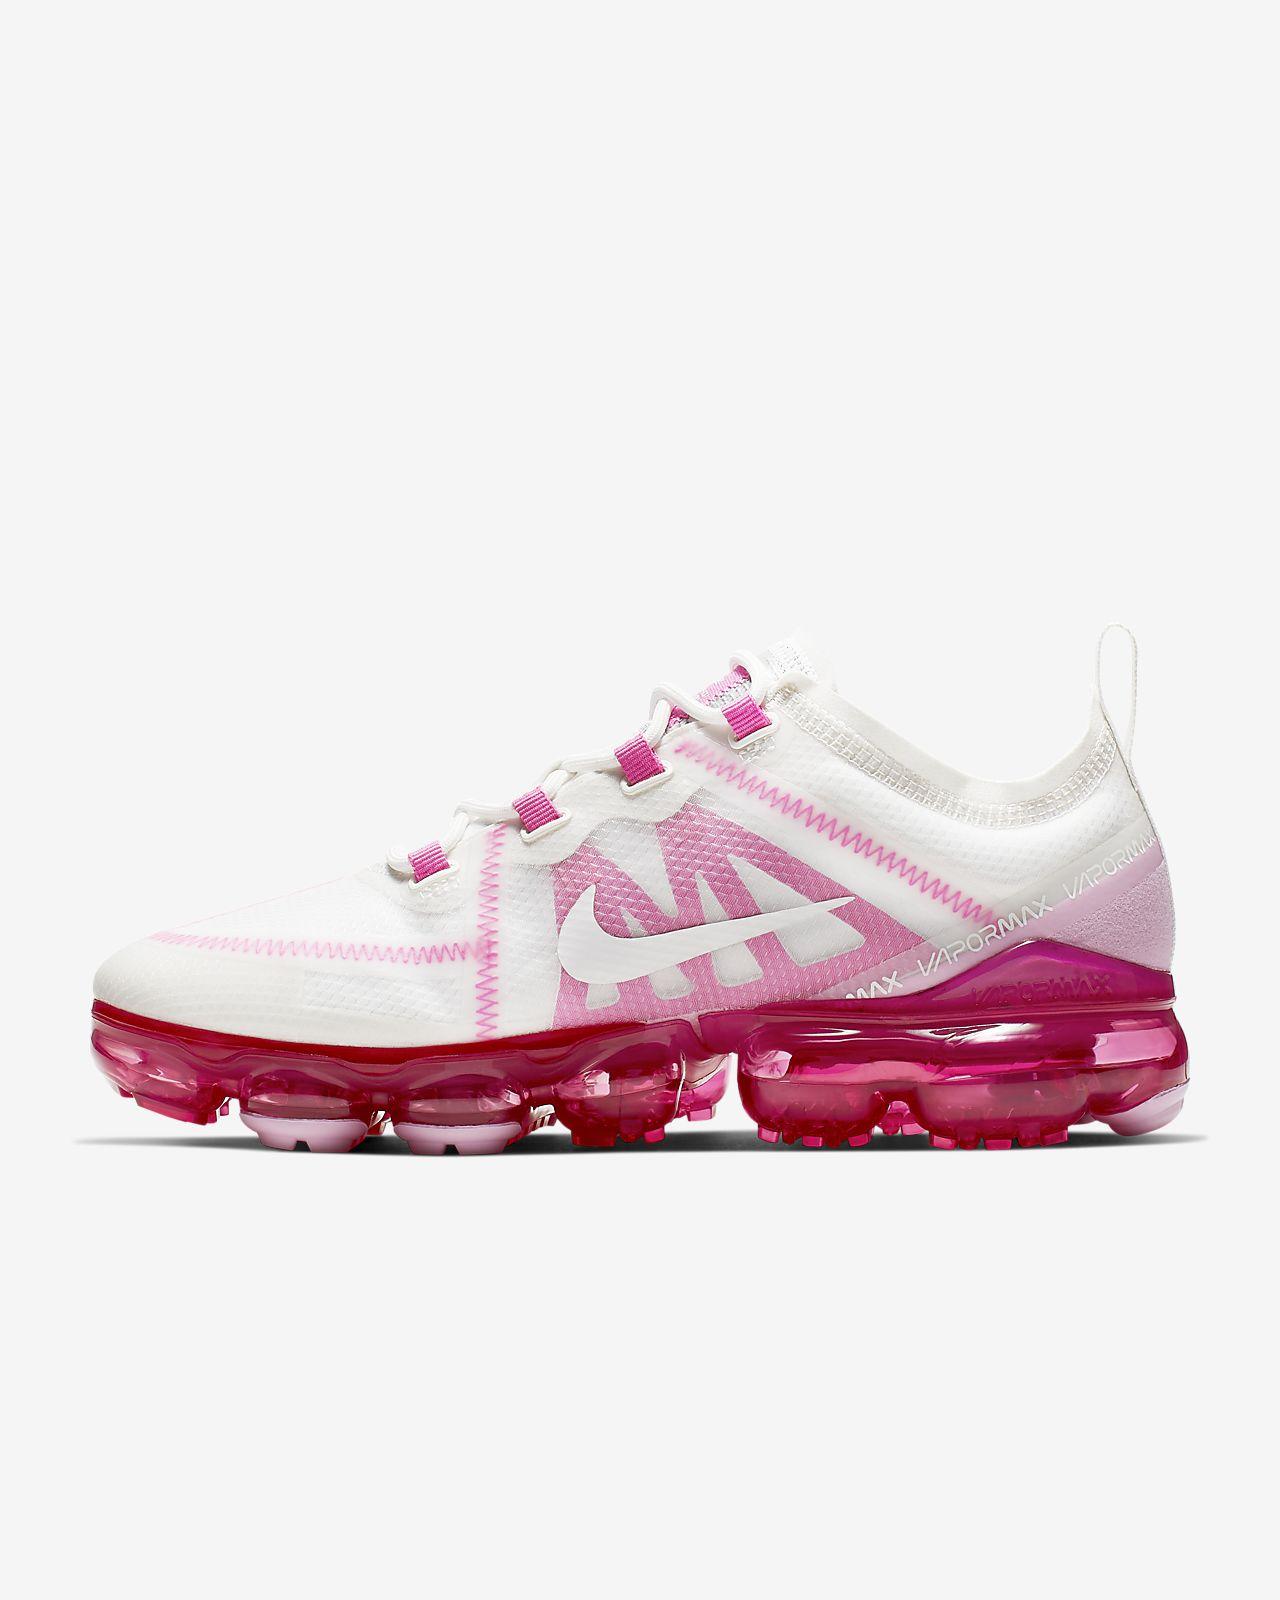 Nike Air VaporMax 2019 Damenschuh